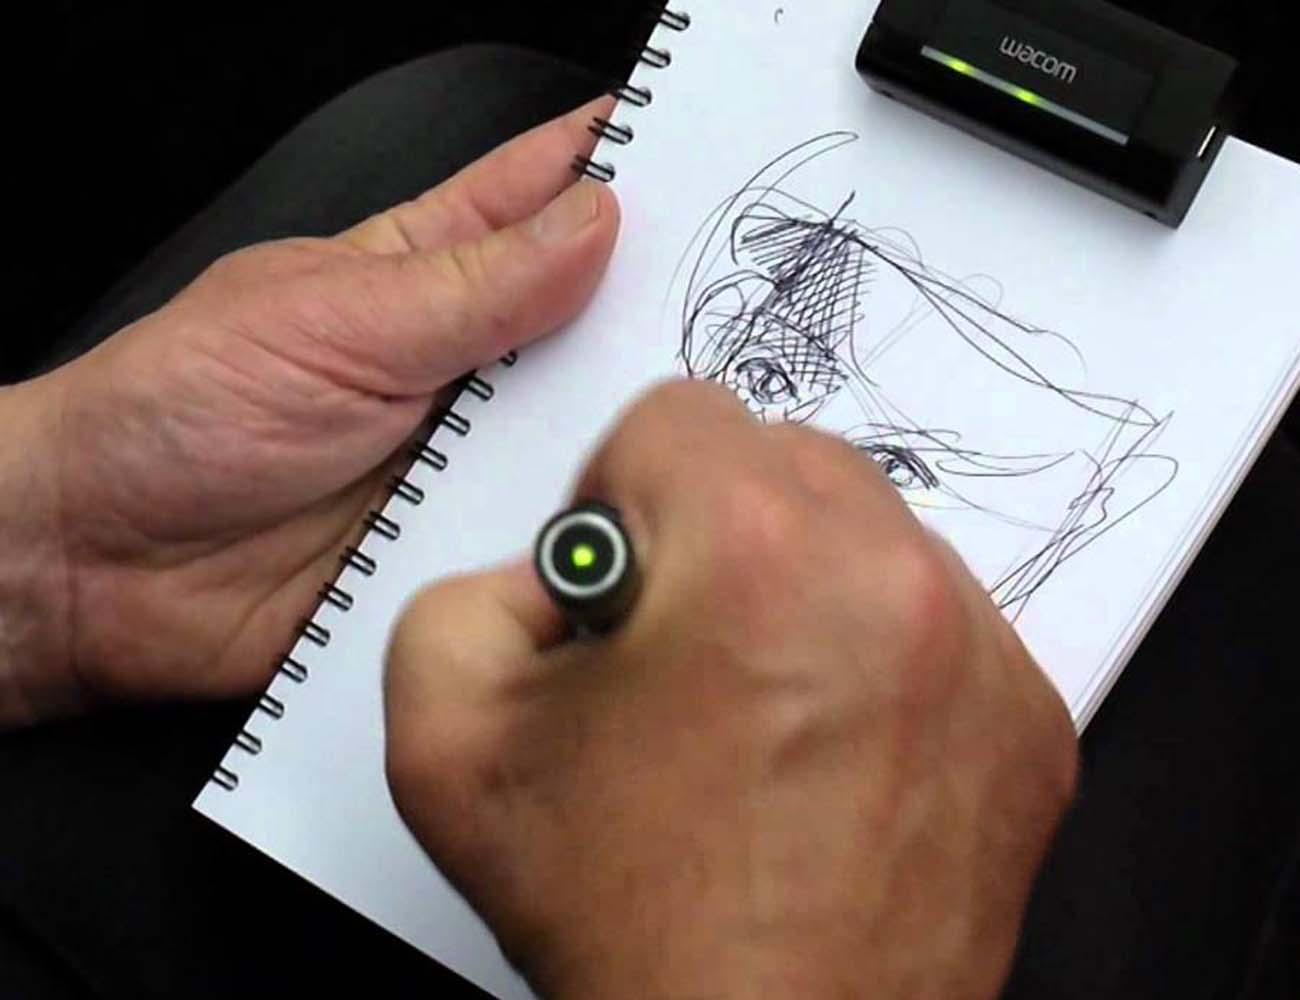 Wacom+Inkling+Digital+Sketch+Pen